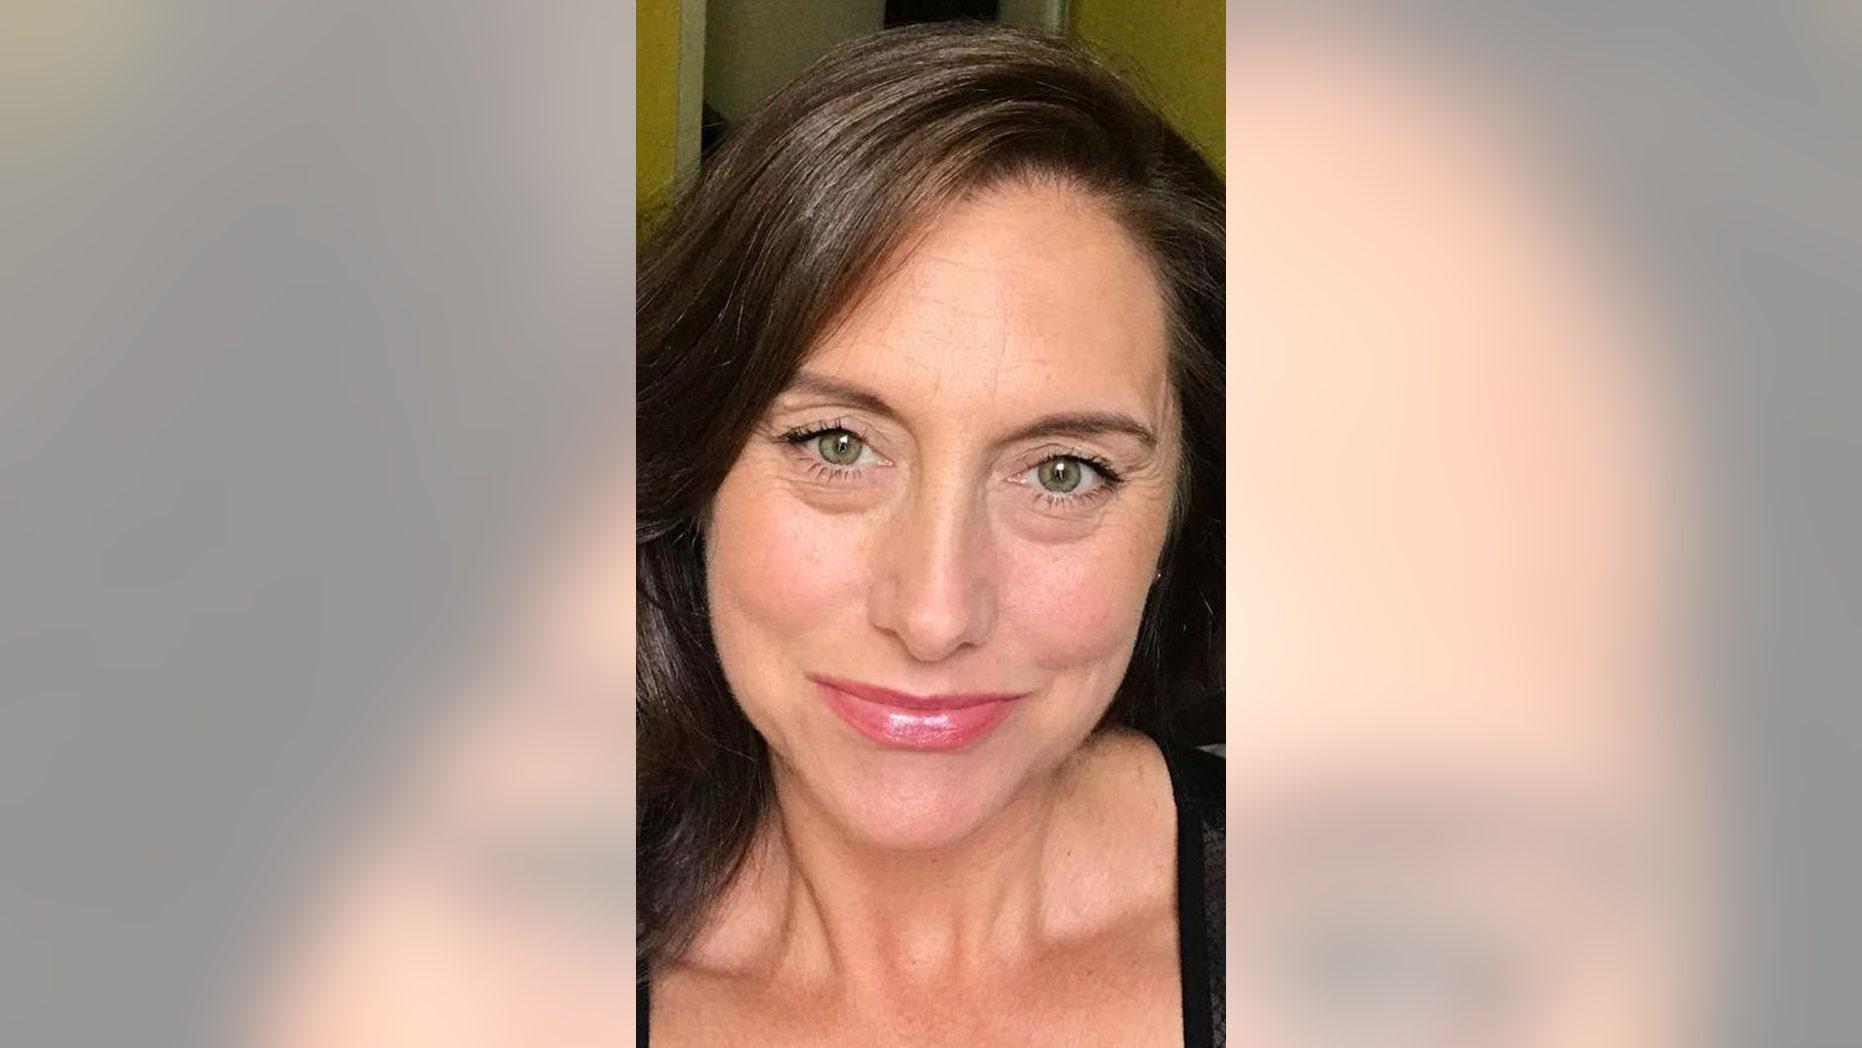 Sarah Wellgreen was last seen on Oct. 9, 2018.